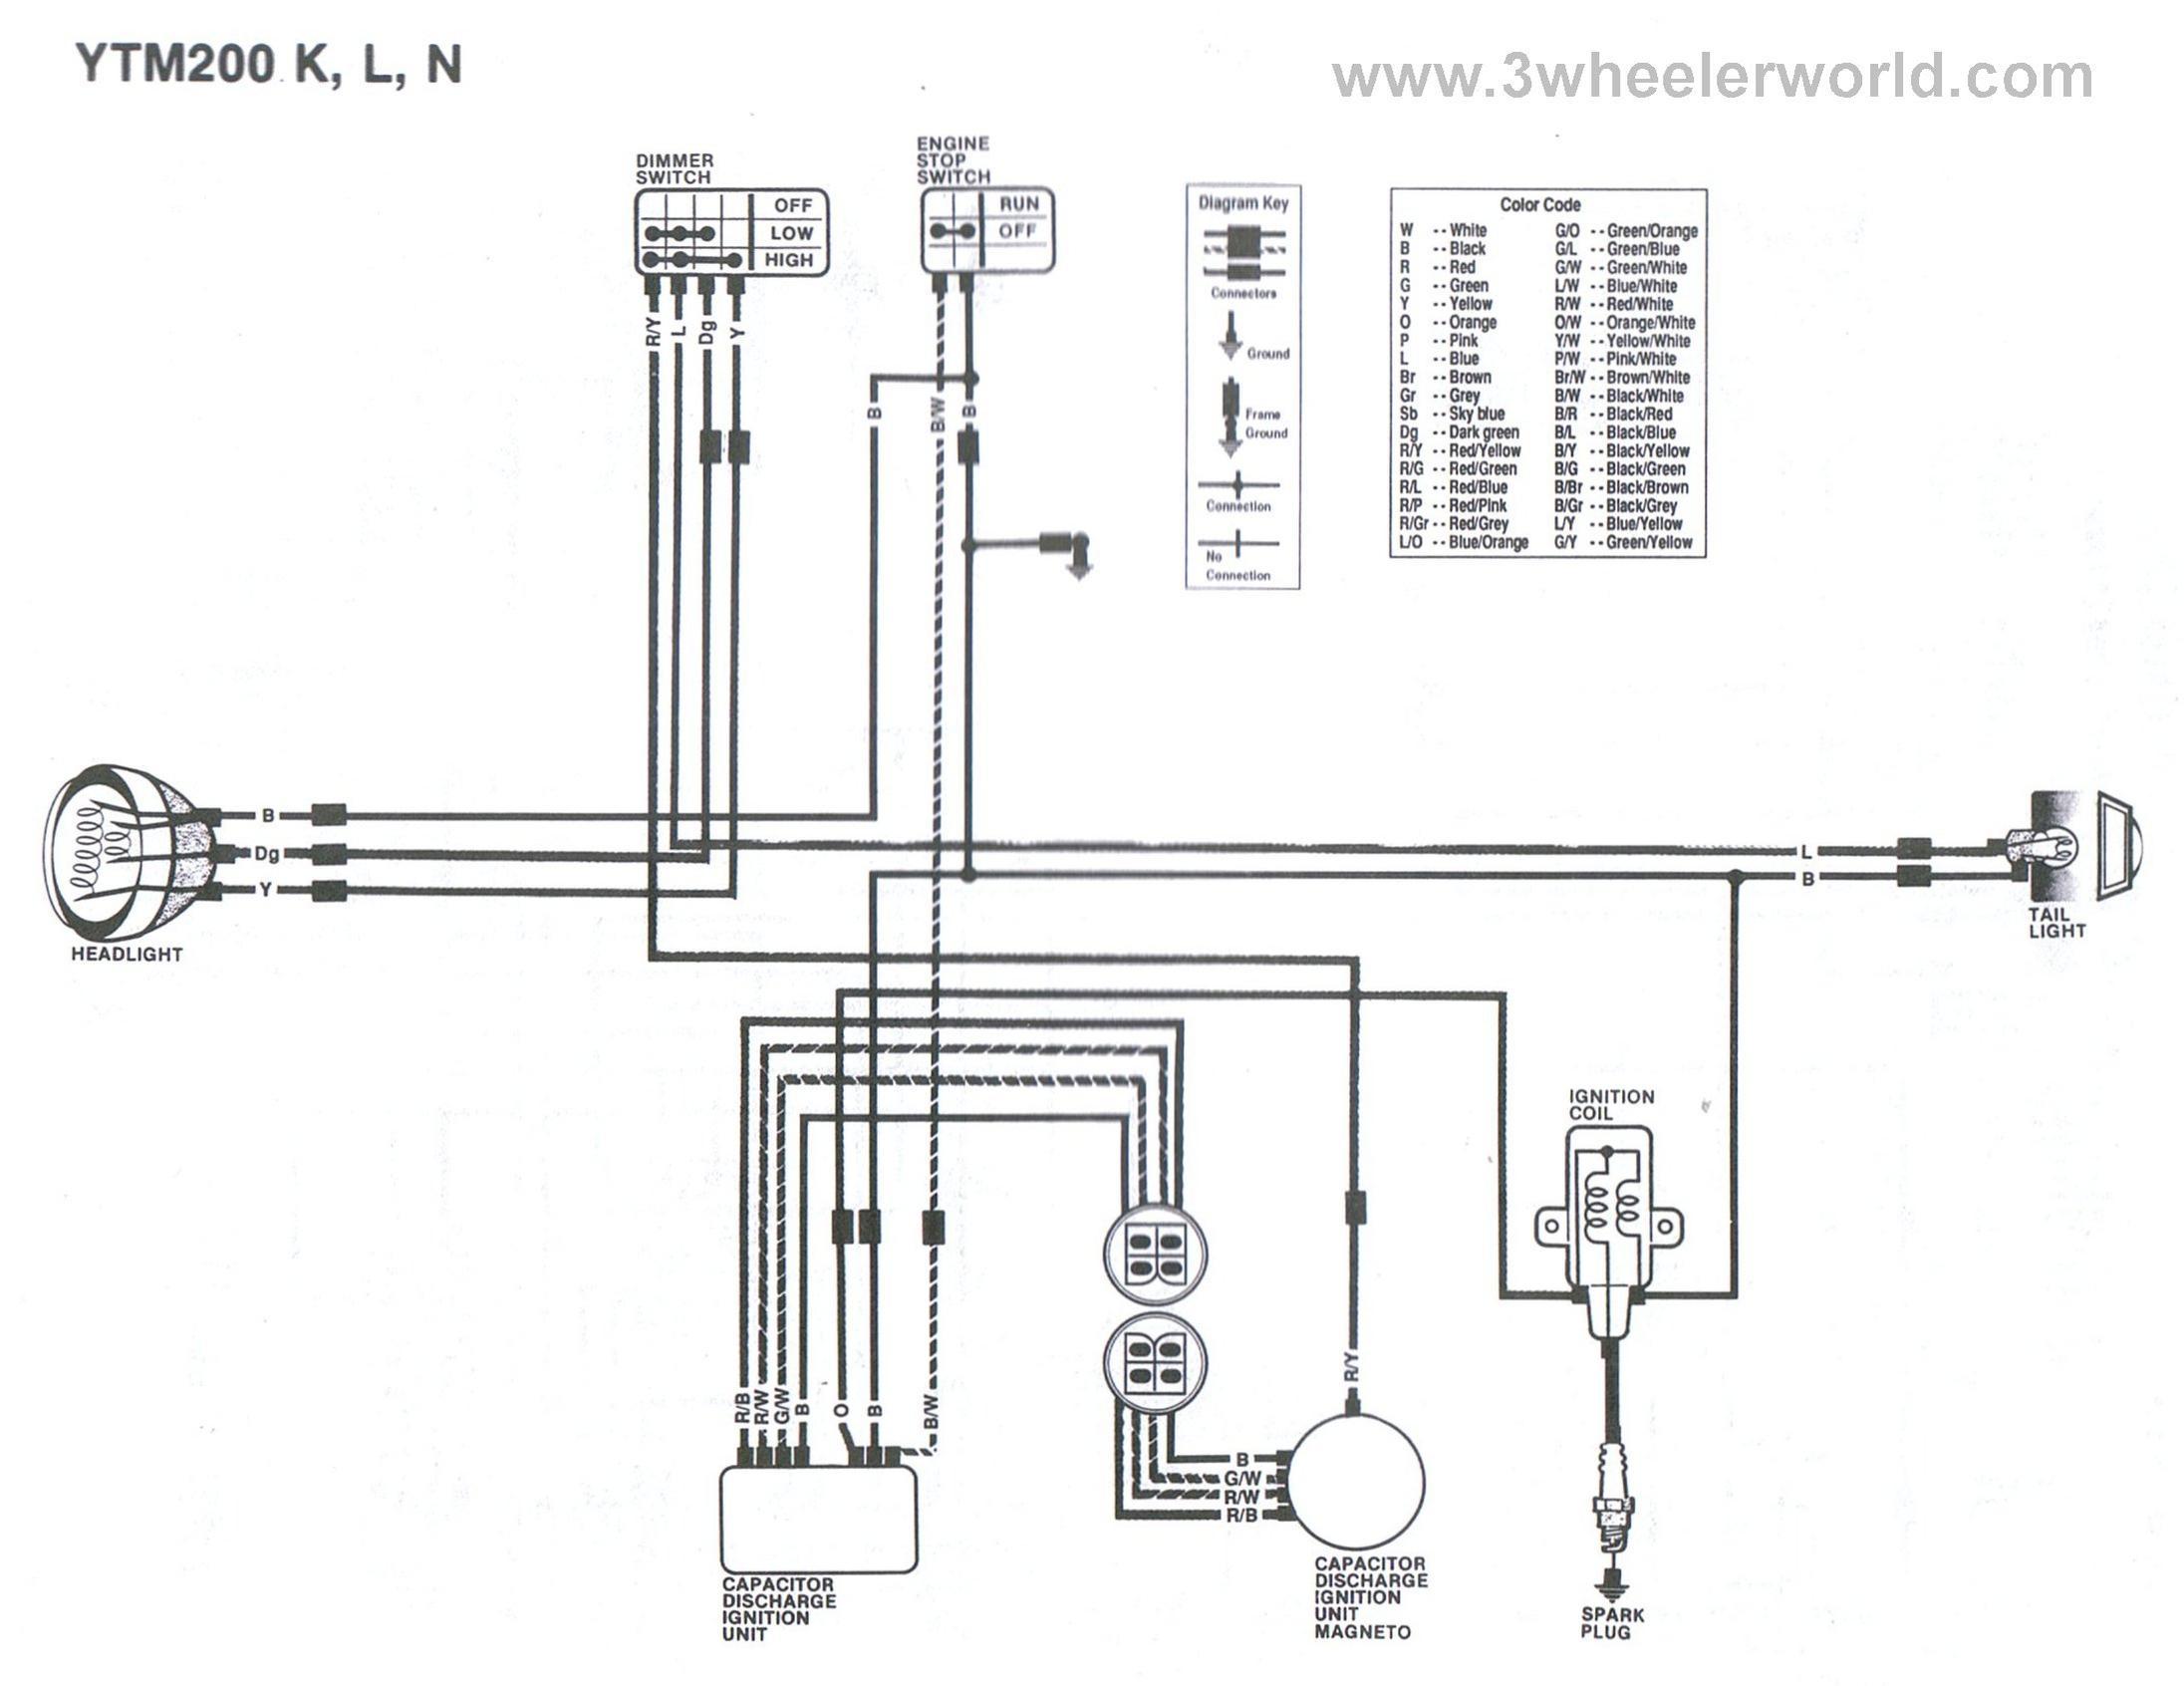 yamaha ydre wiring diagram php yamaha wiring exles and